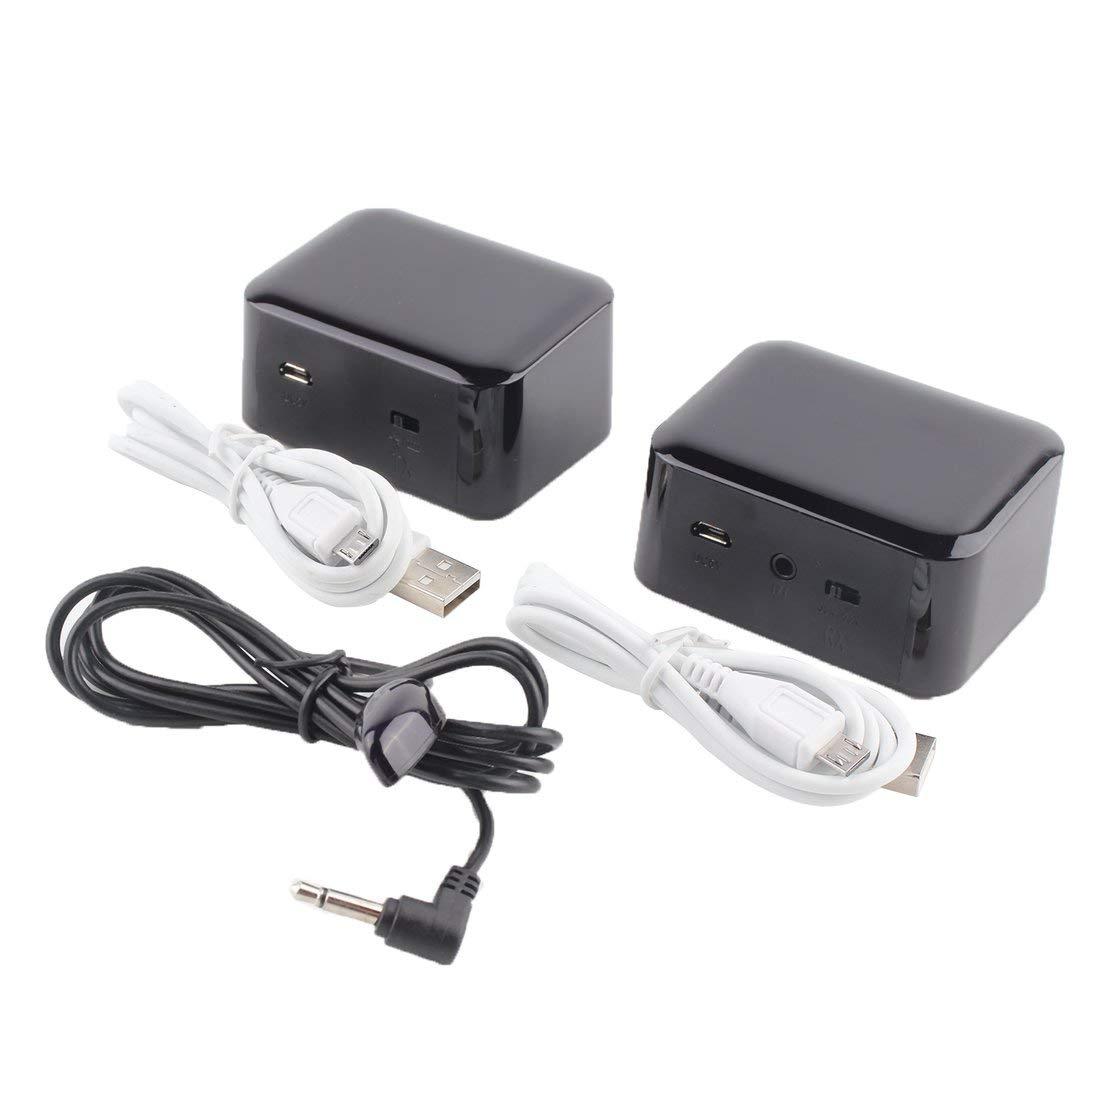 Wireless IR Remote Extender Repeater Dual Frequency Sender Empfä nger System Kit Blaster Emitter fü r IR-Gerä te - schwarz Formulaone